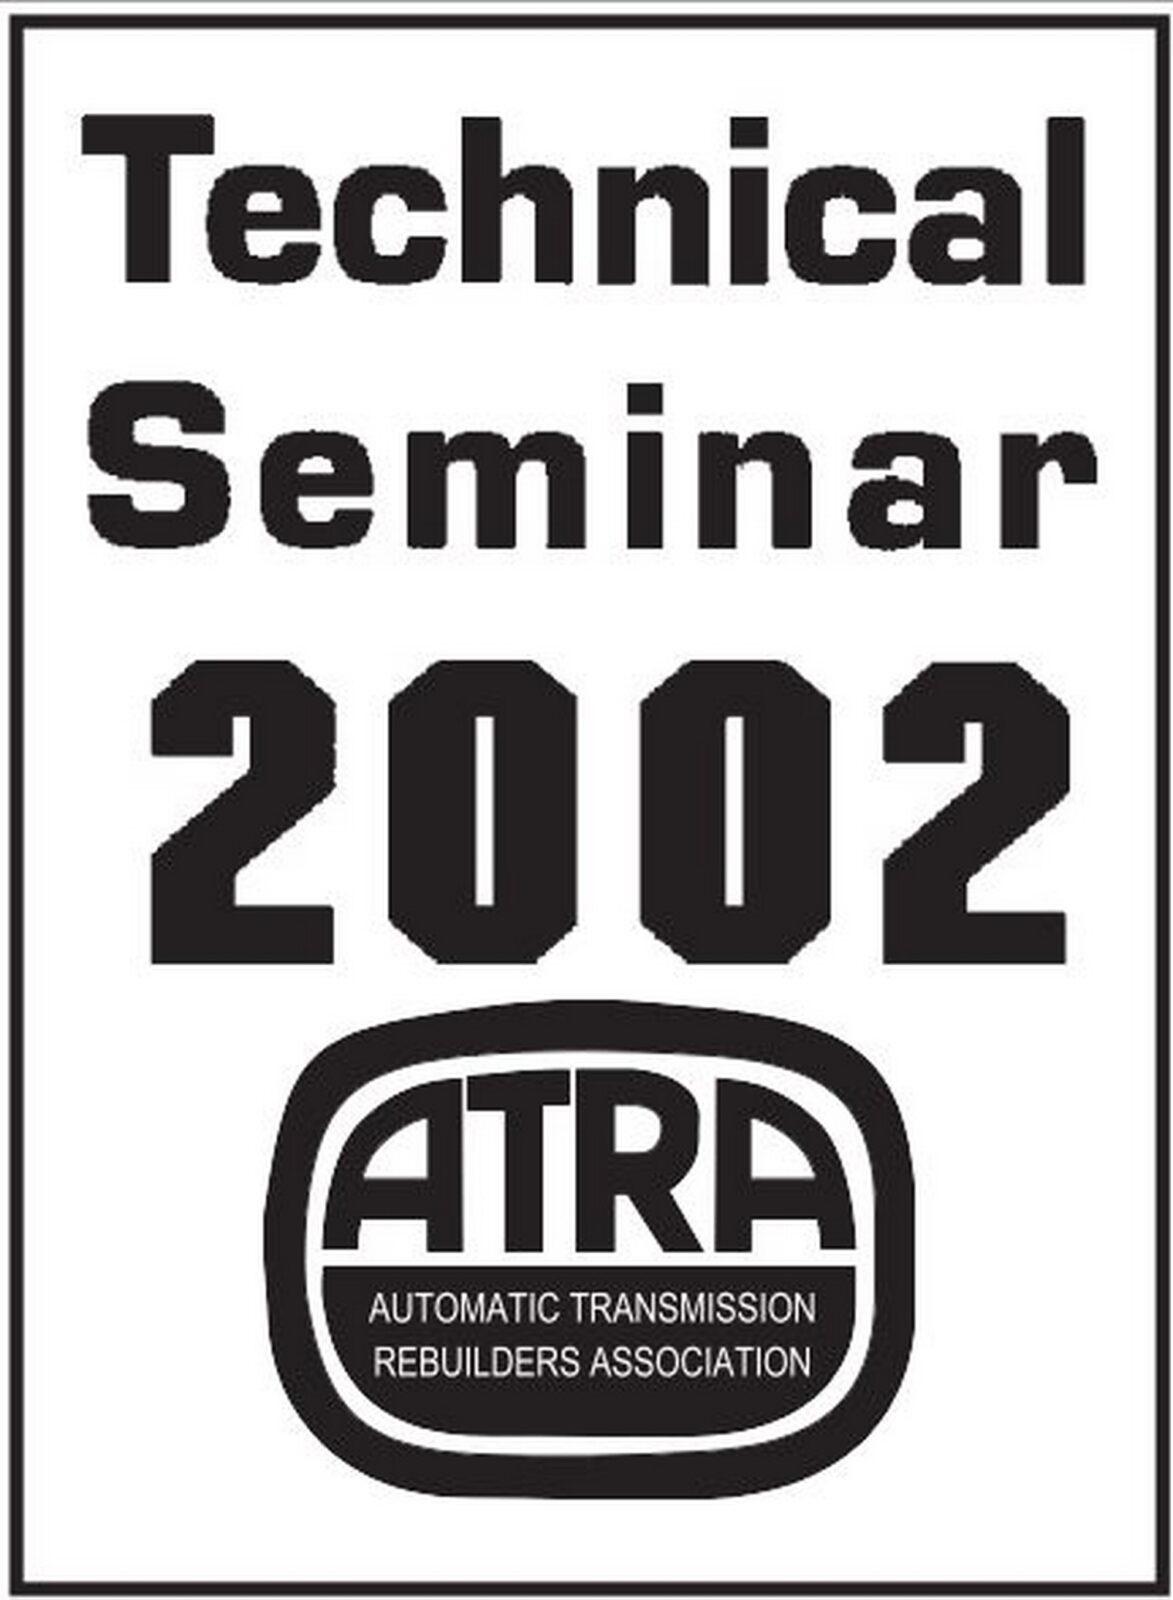 2002 ATRA Seminar Manual Contents